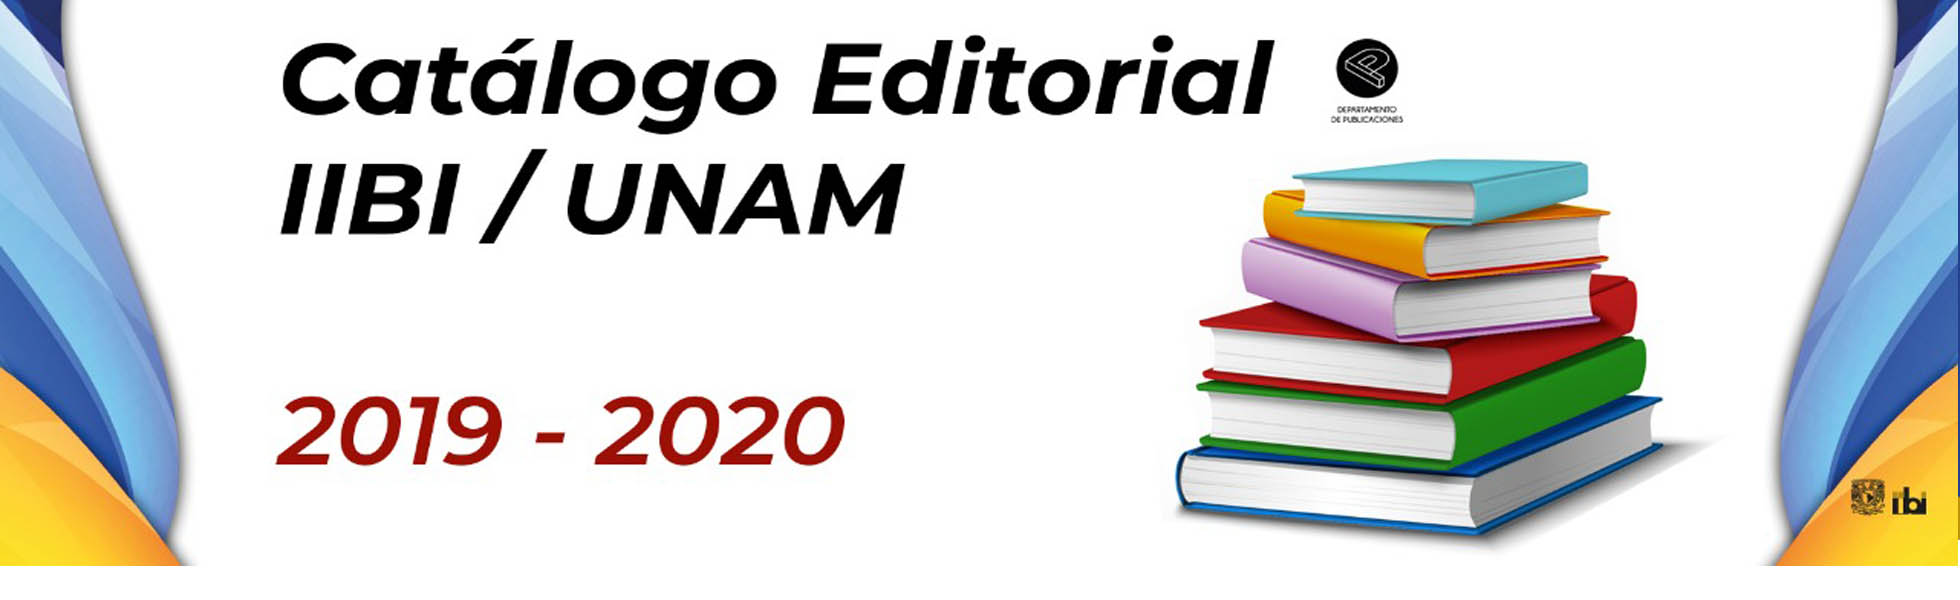 Cátalogo Editorial IIBI UNAM